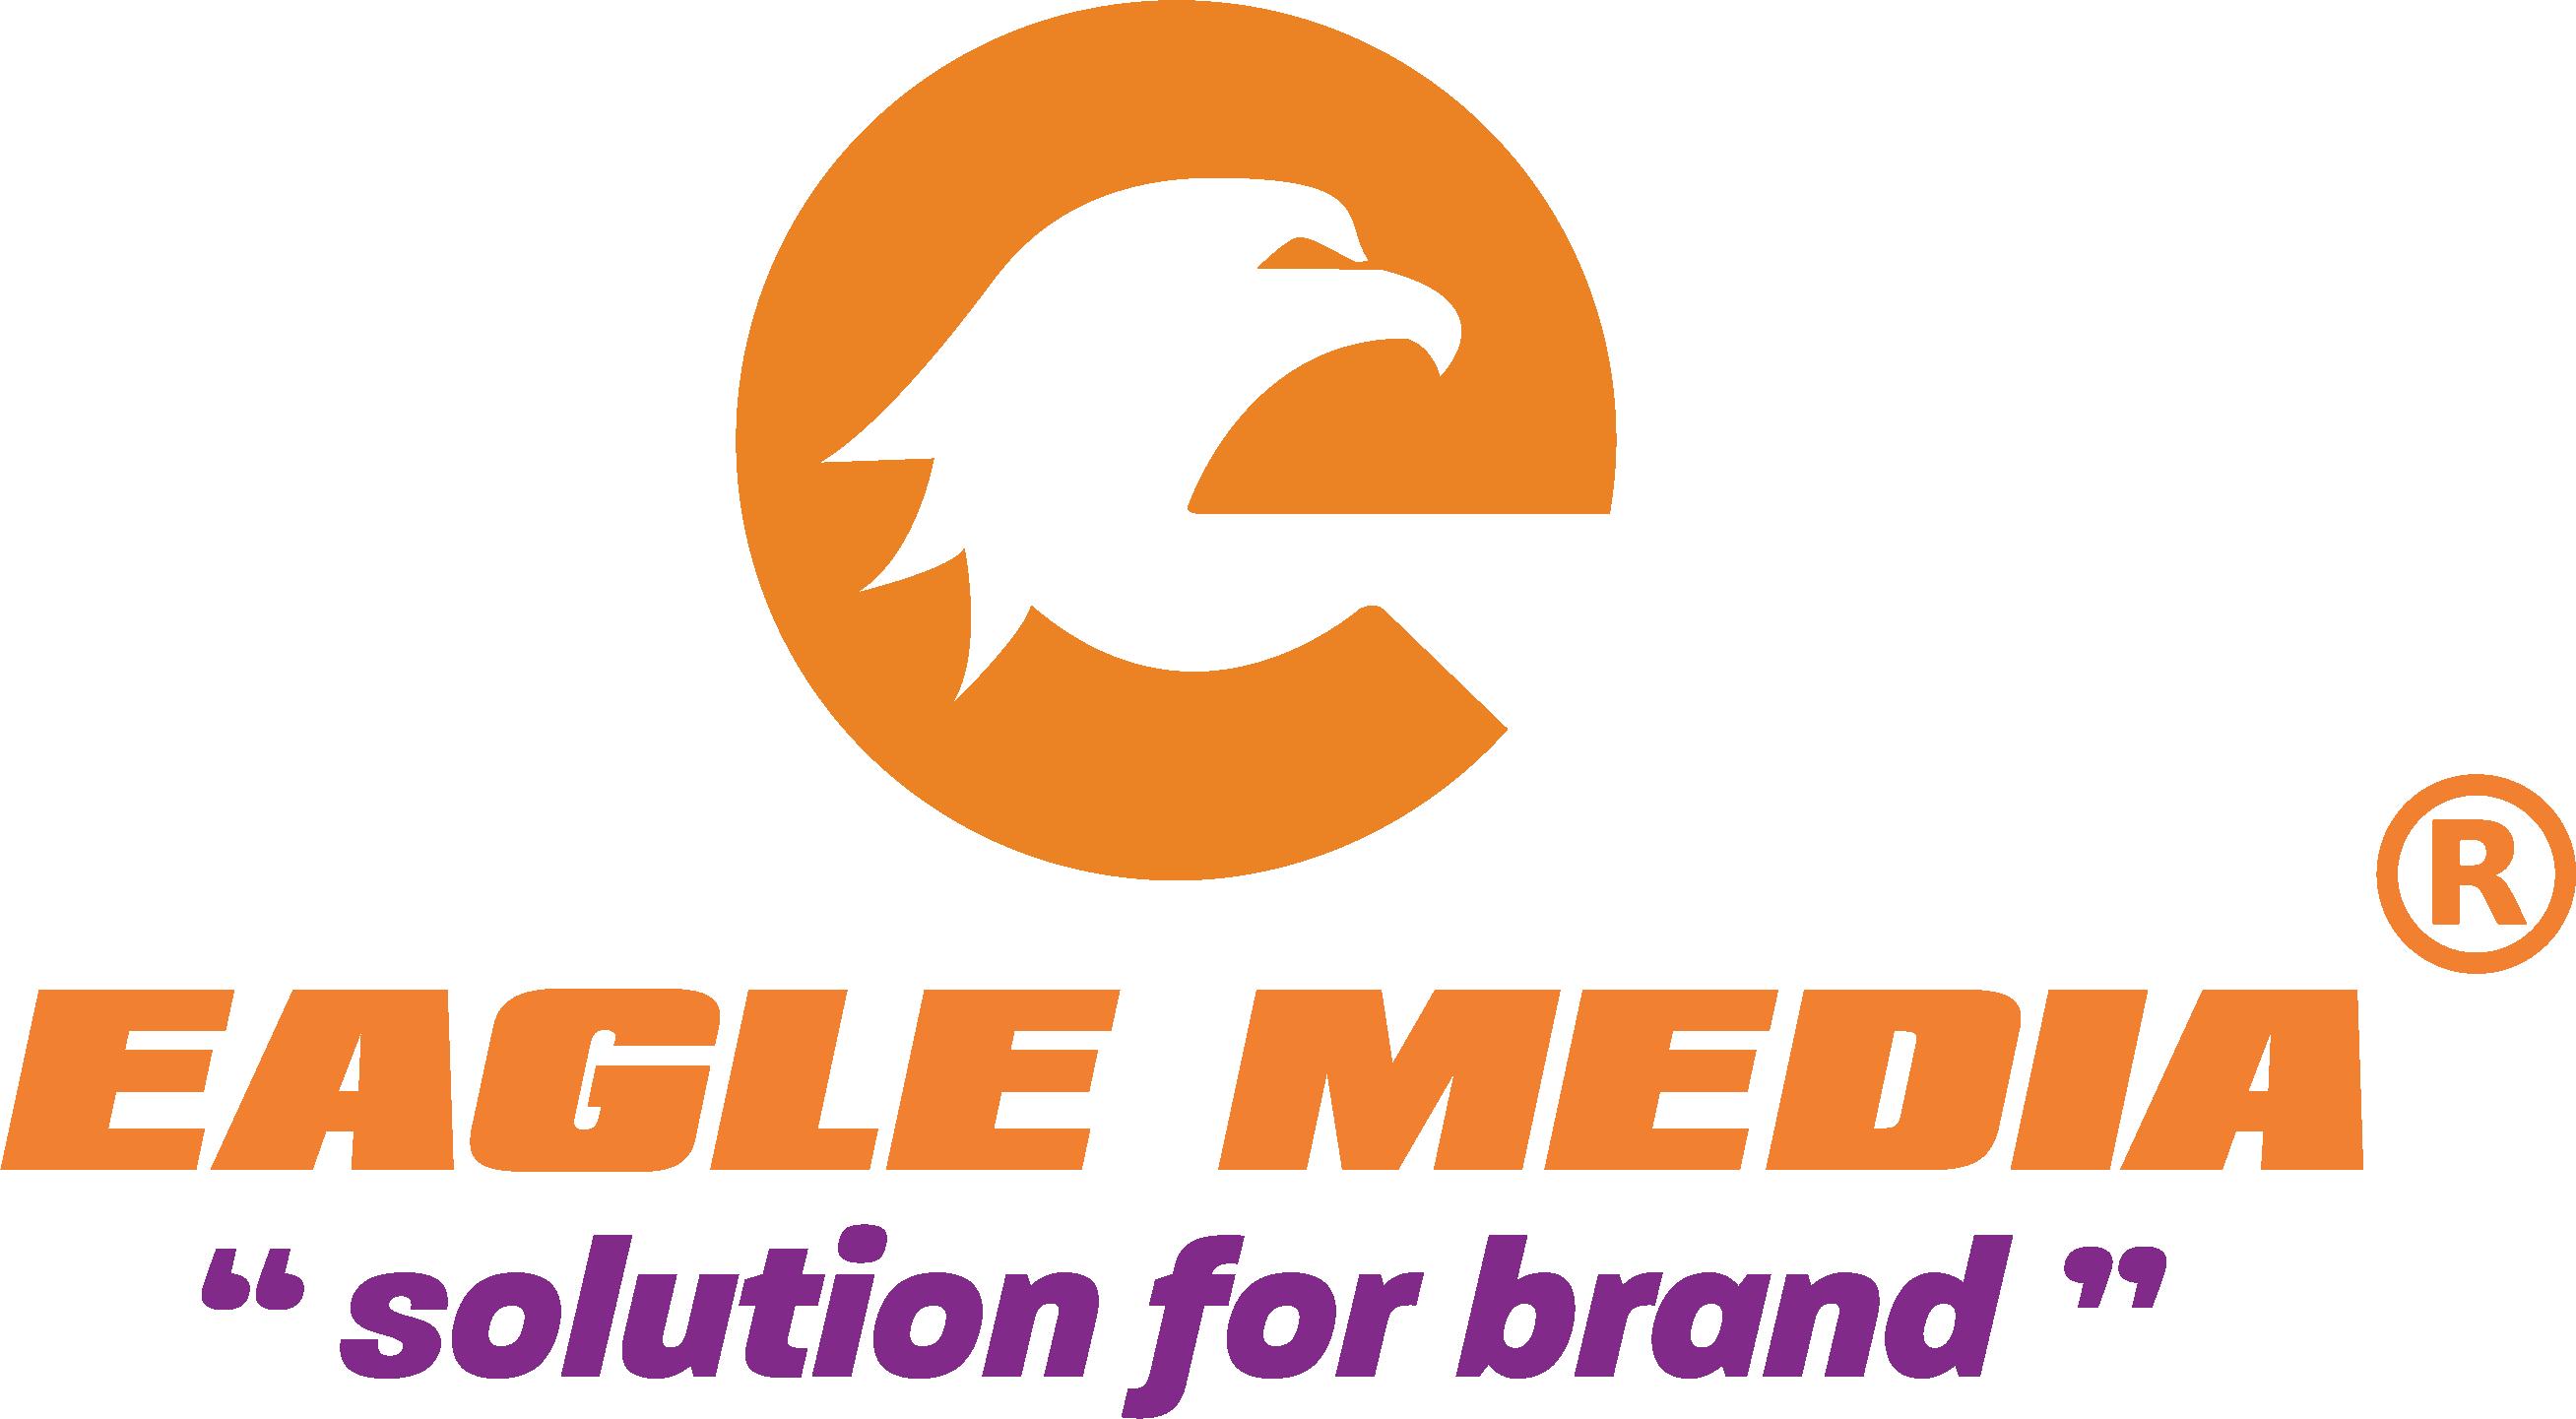 EagleMedia